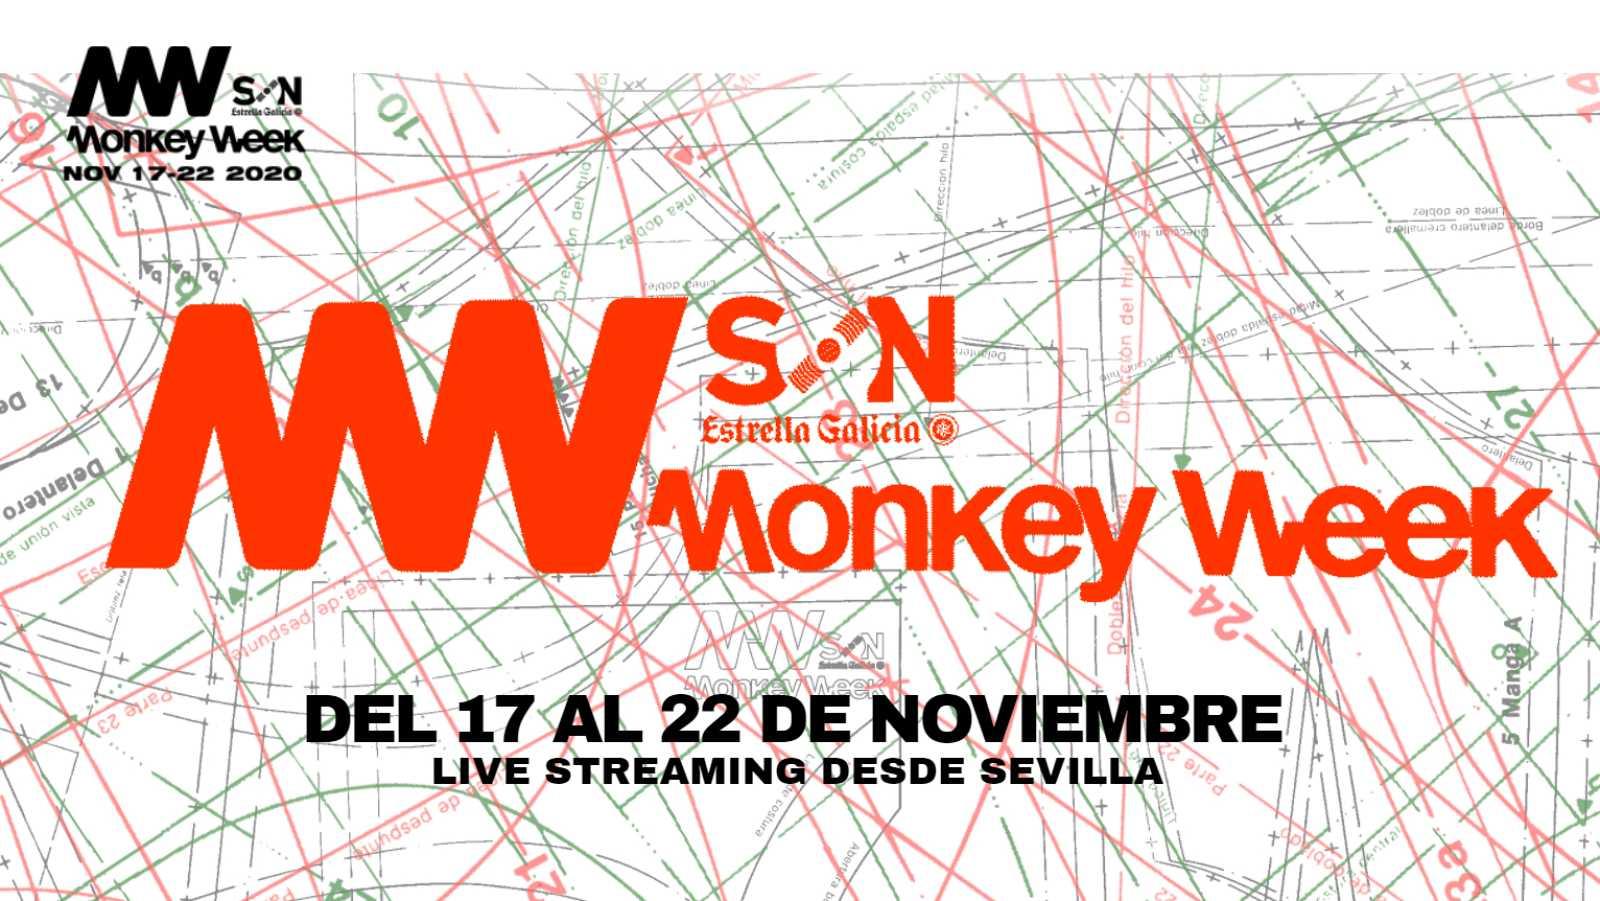 monkey week 2020